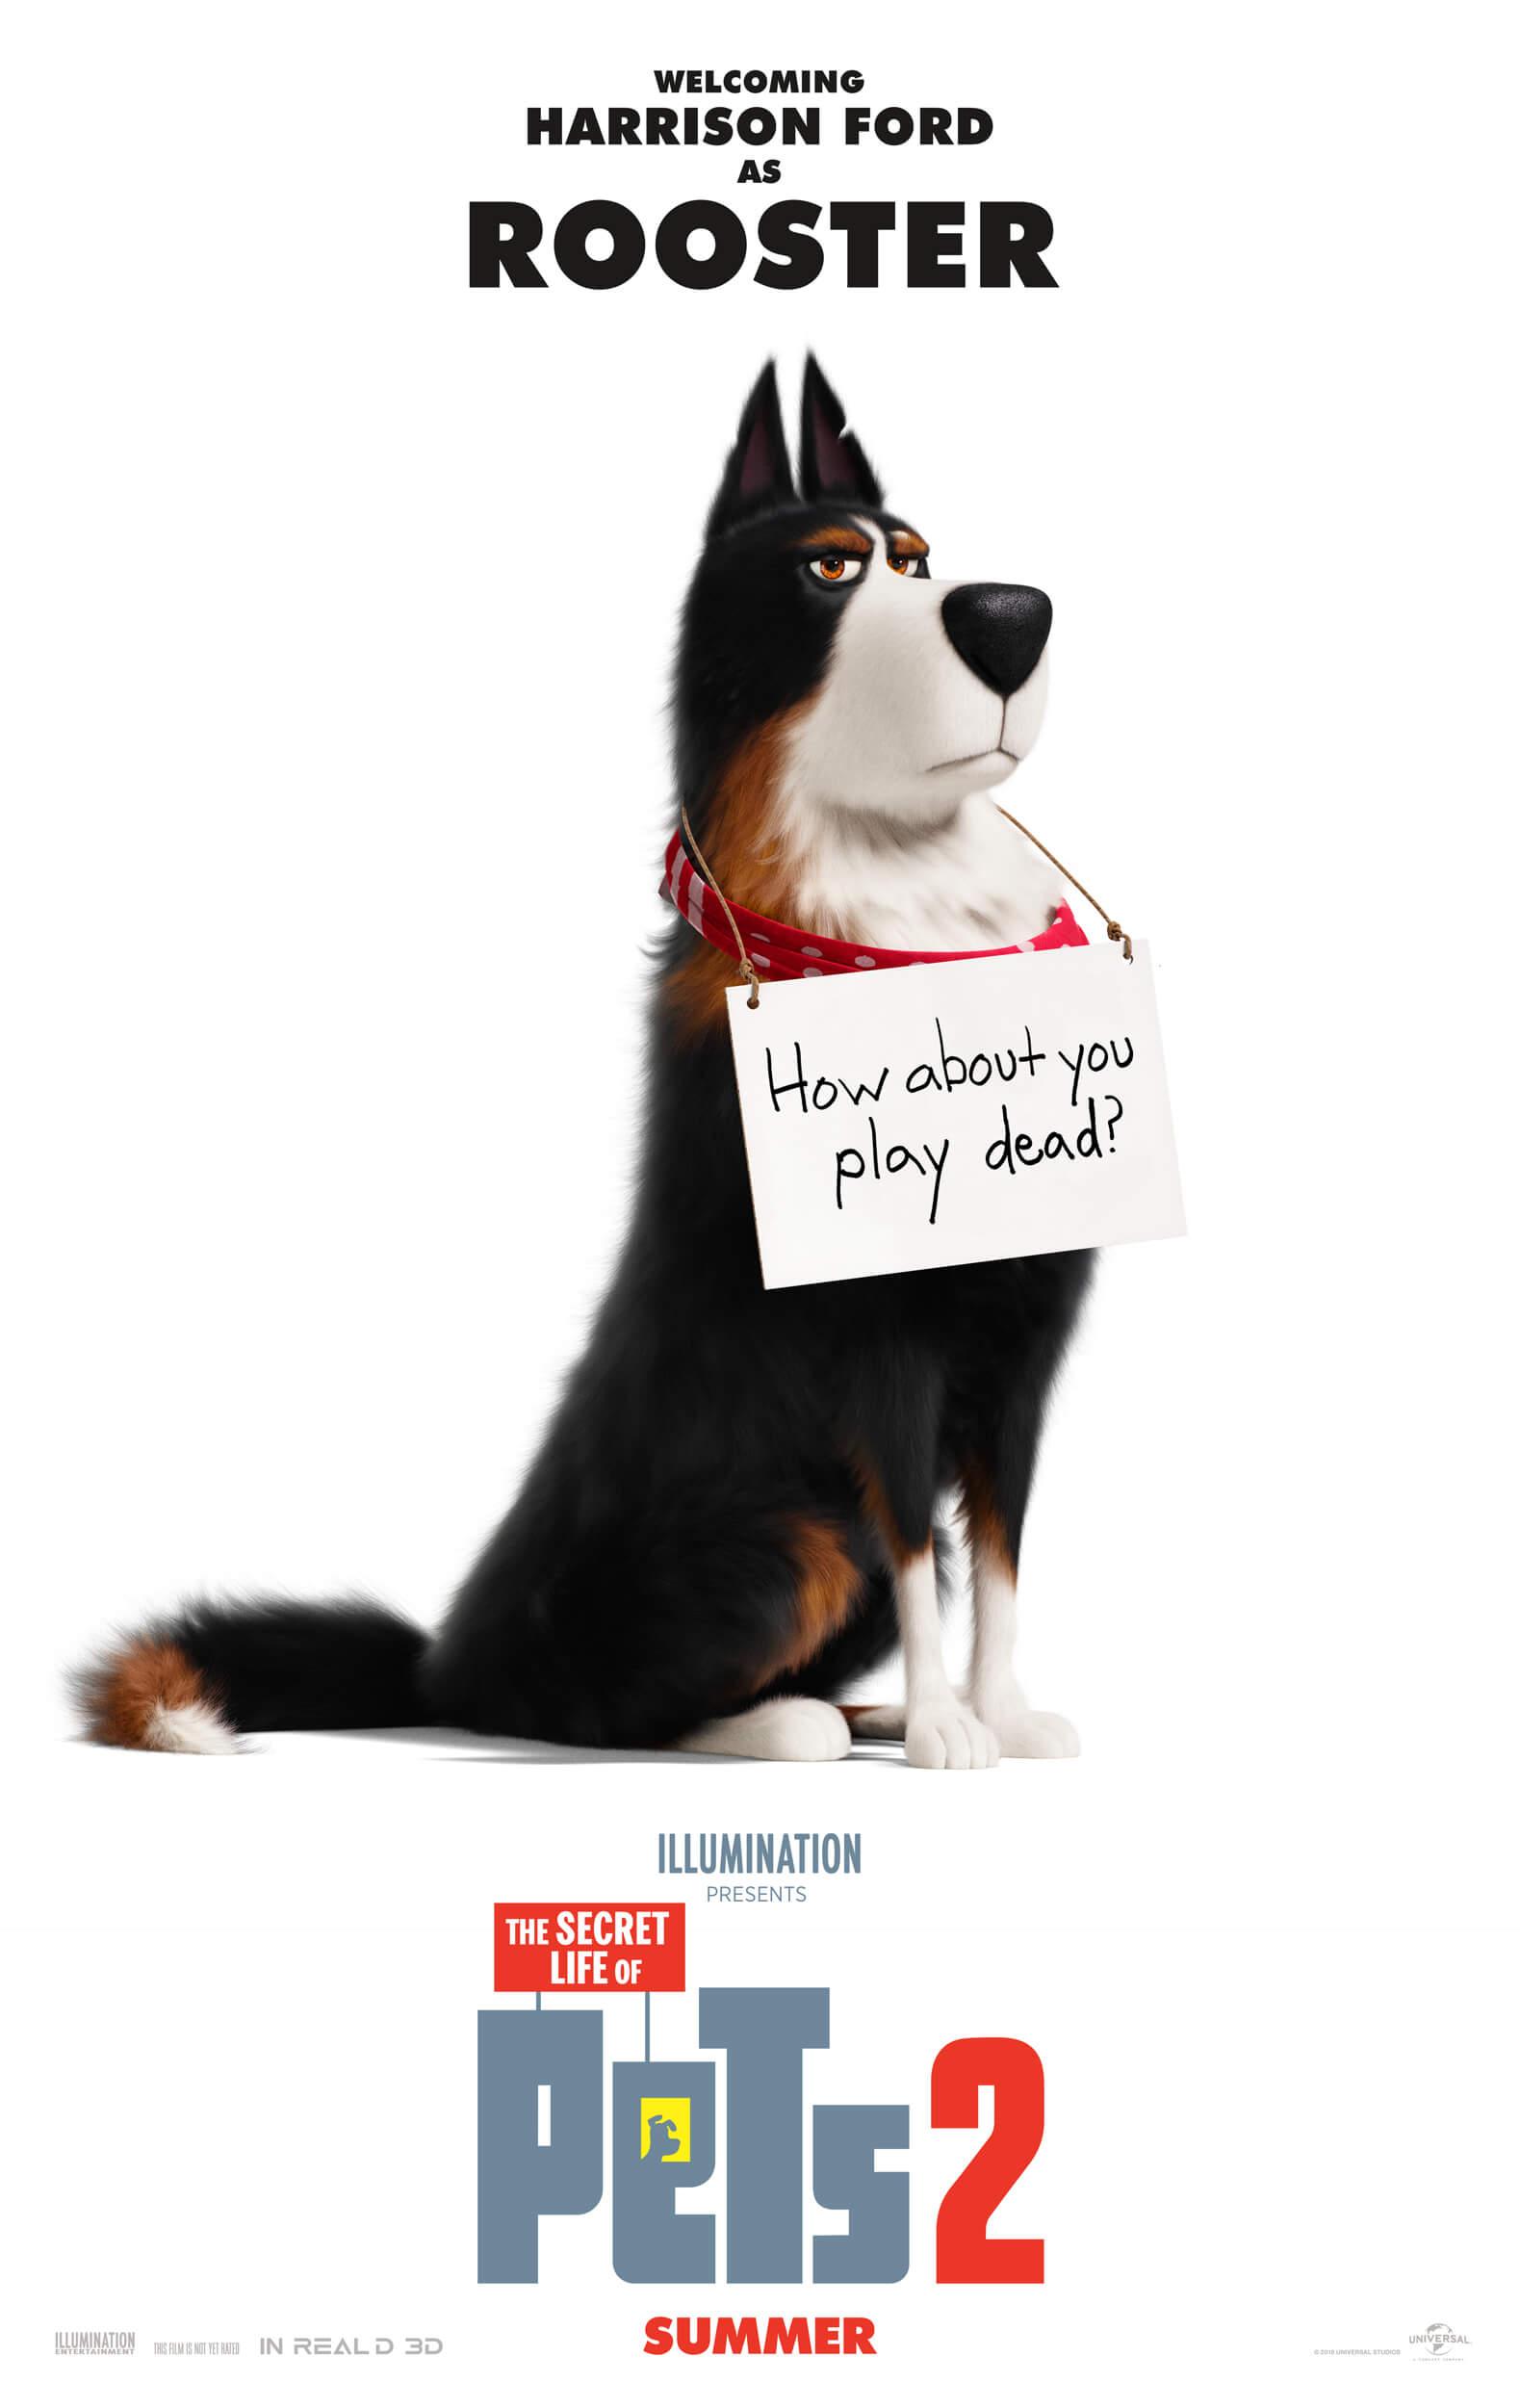 The Secret Life of Pets 2 | Own It On Digital Now | 4K Ultra